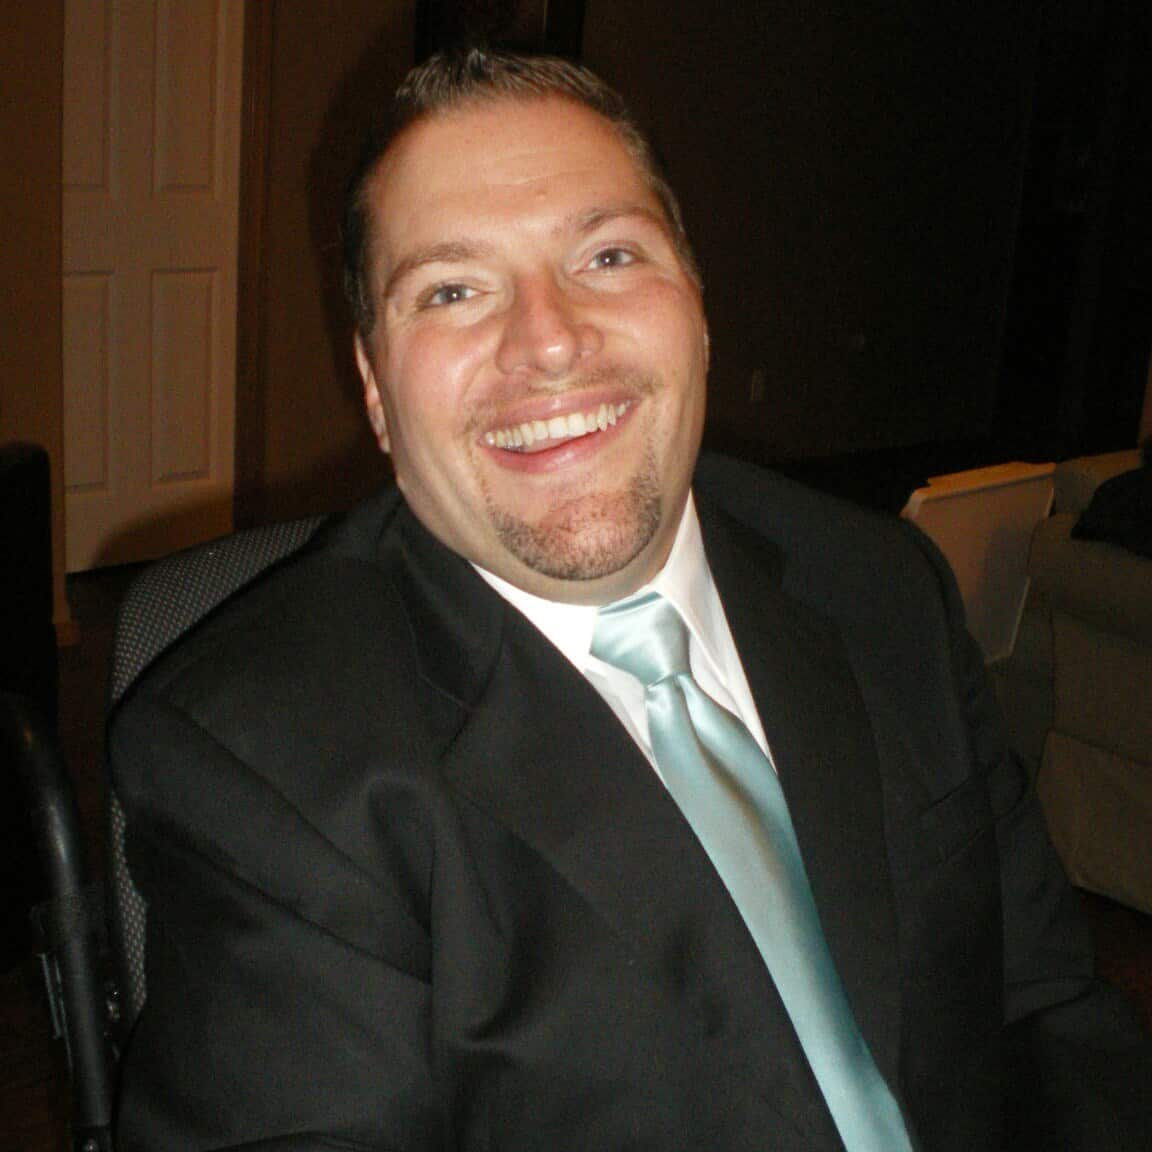 Guest author, Shawn Murinko